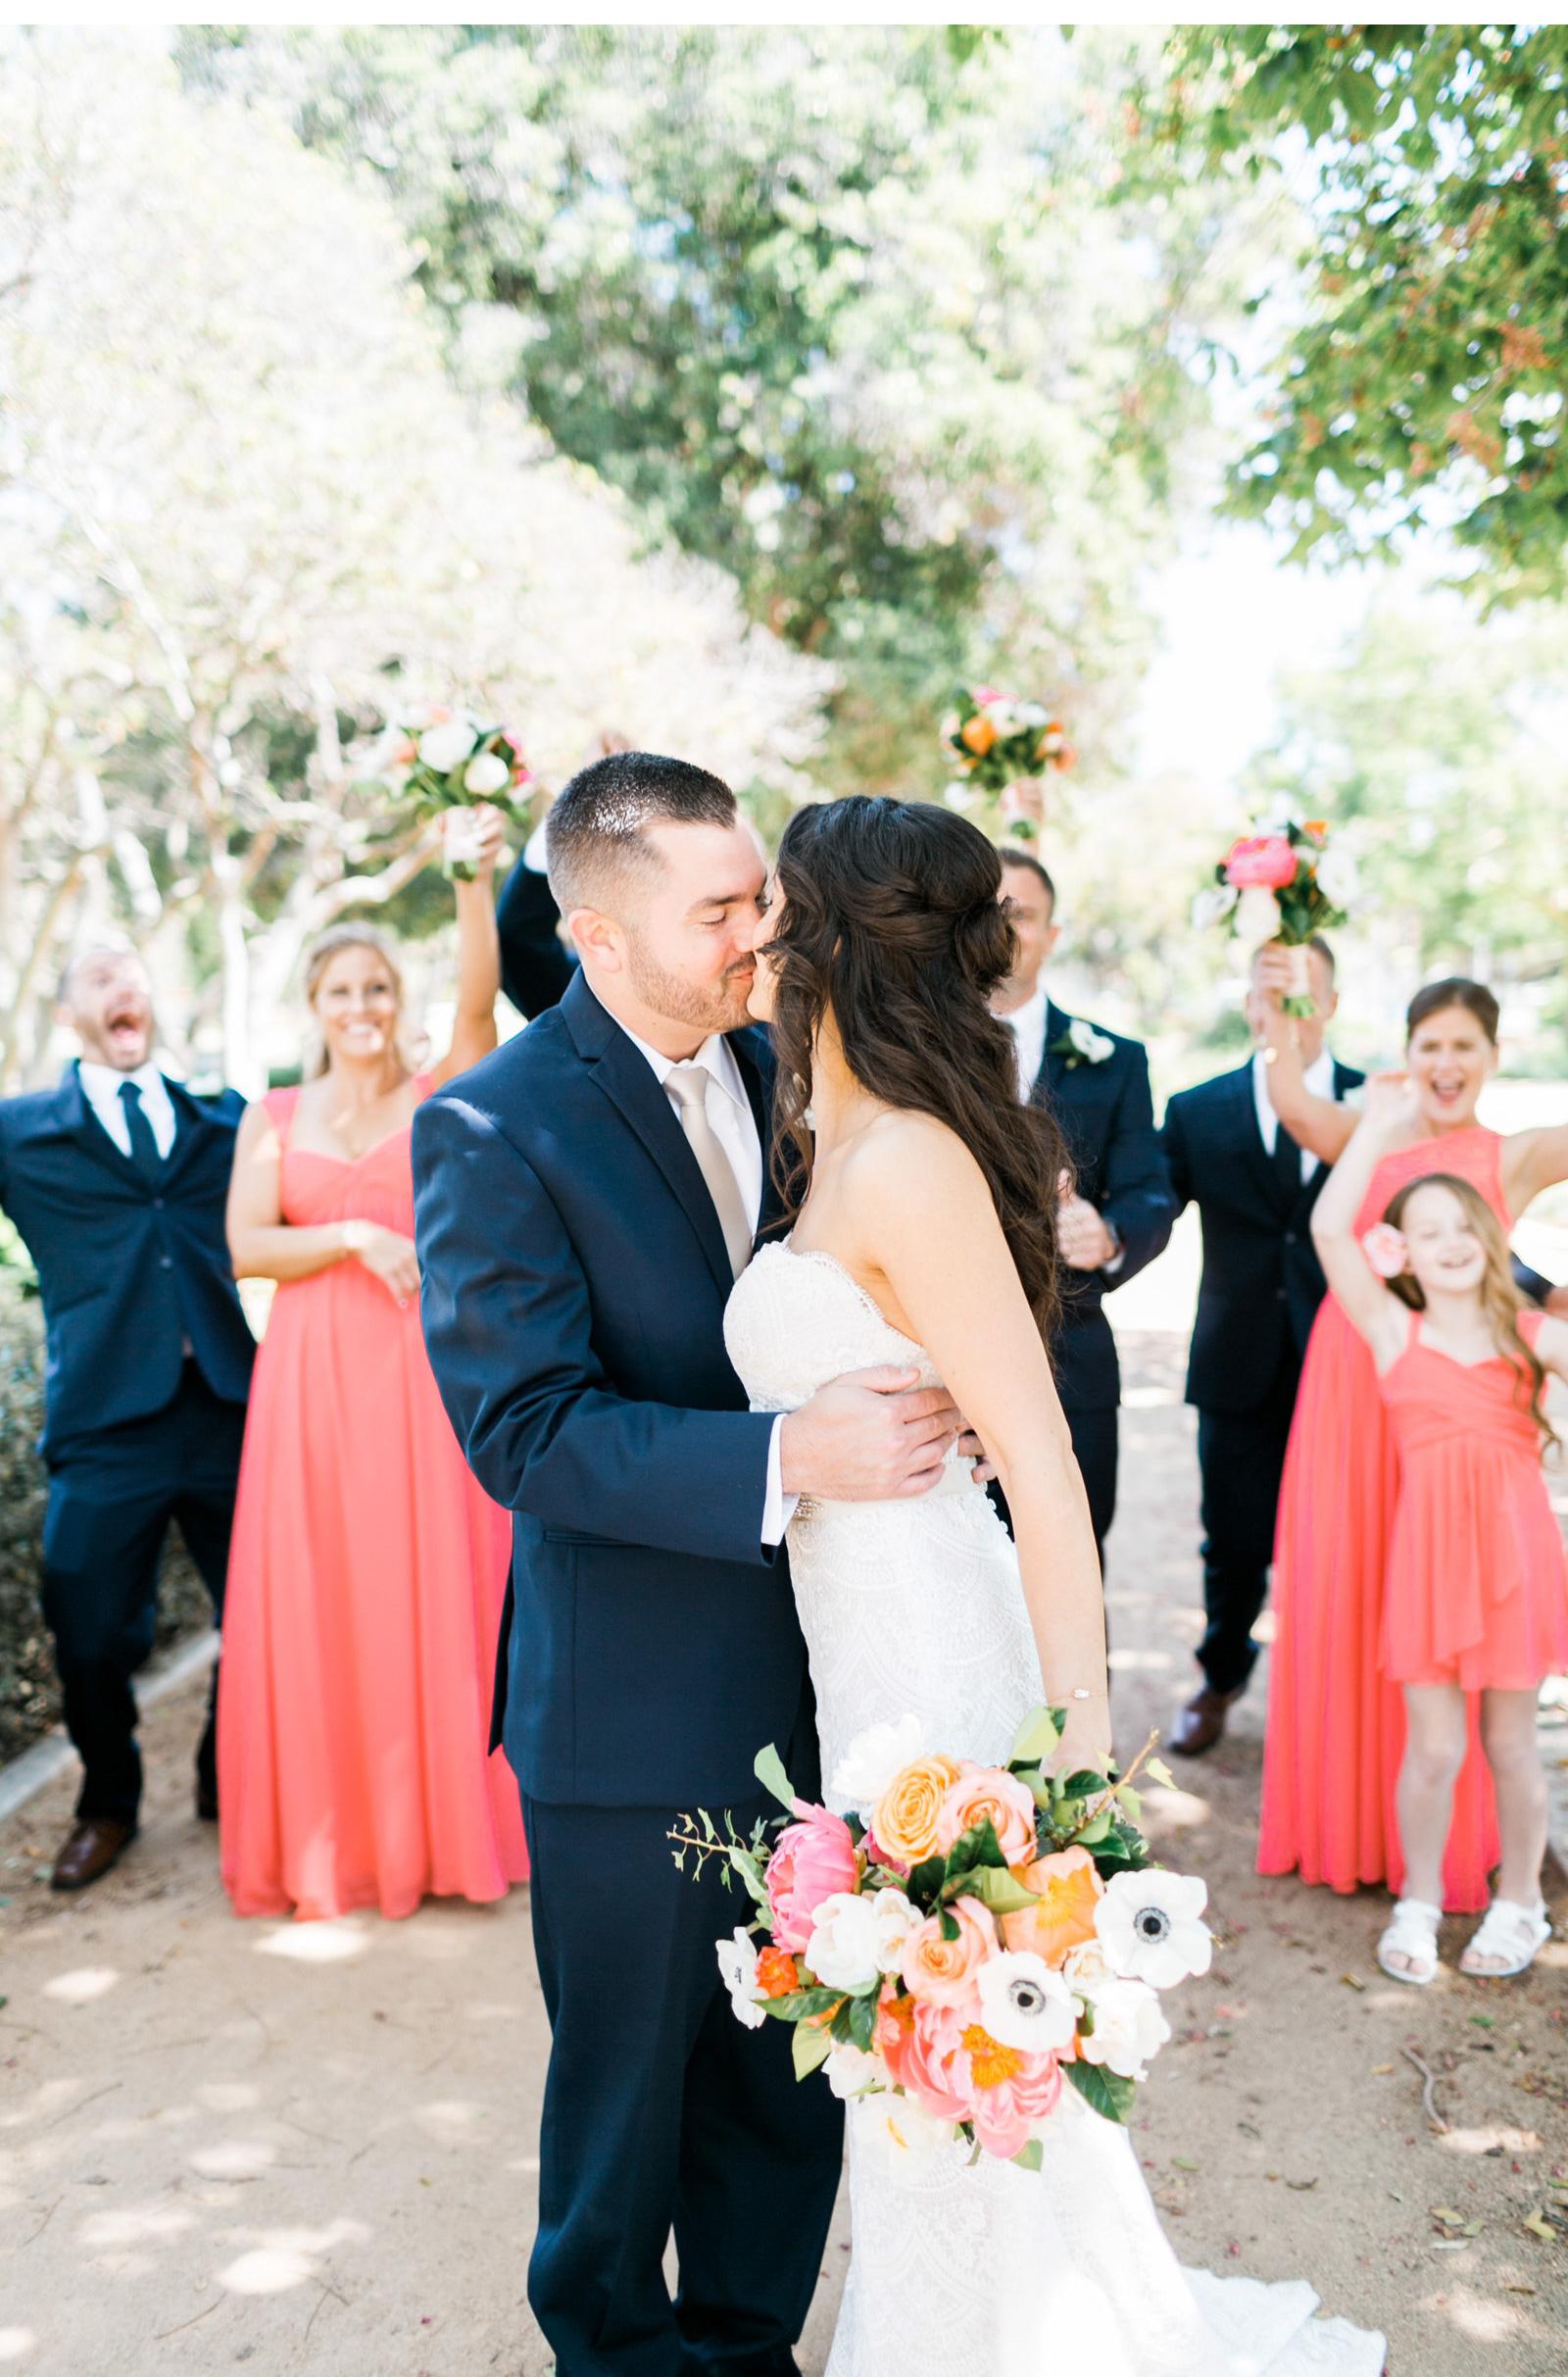 Santa-Barbara-Wedding-Natalie-Schutt-Photography_02.jpg